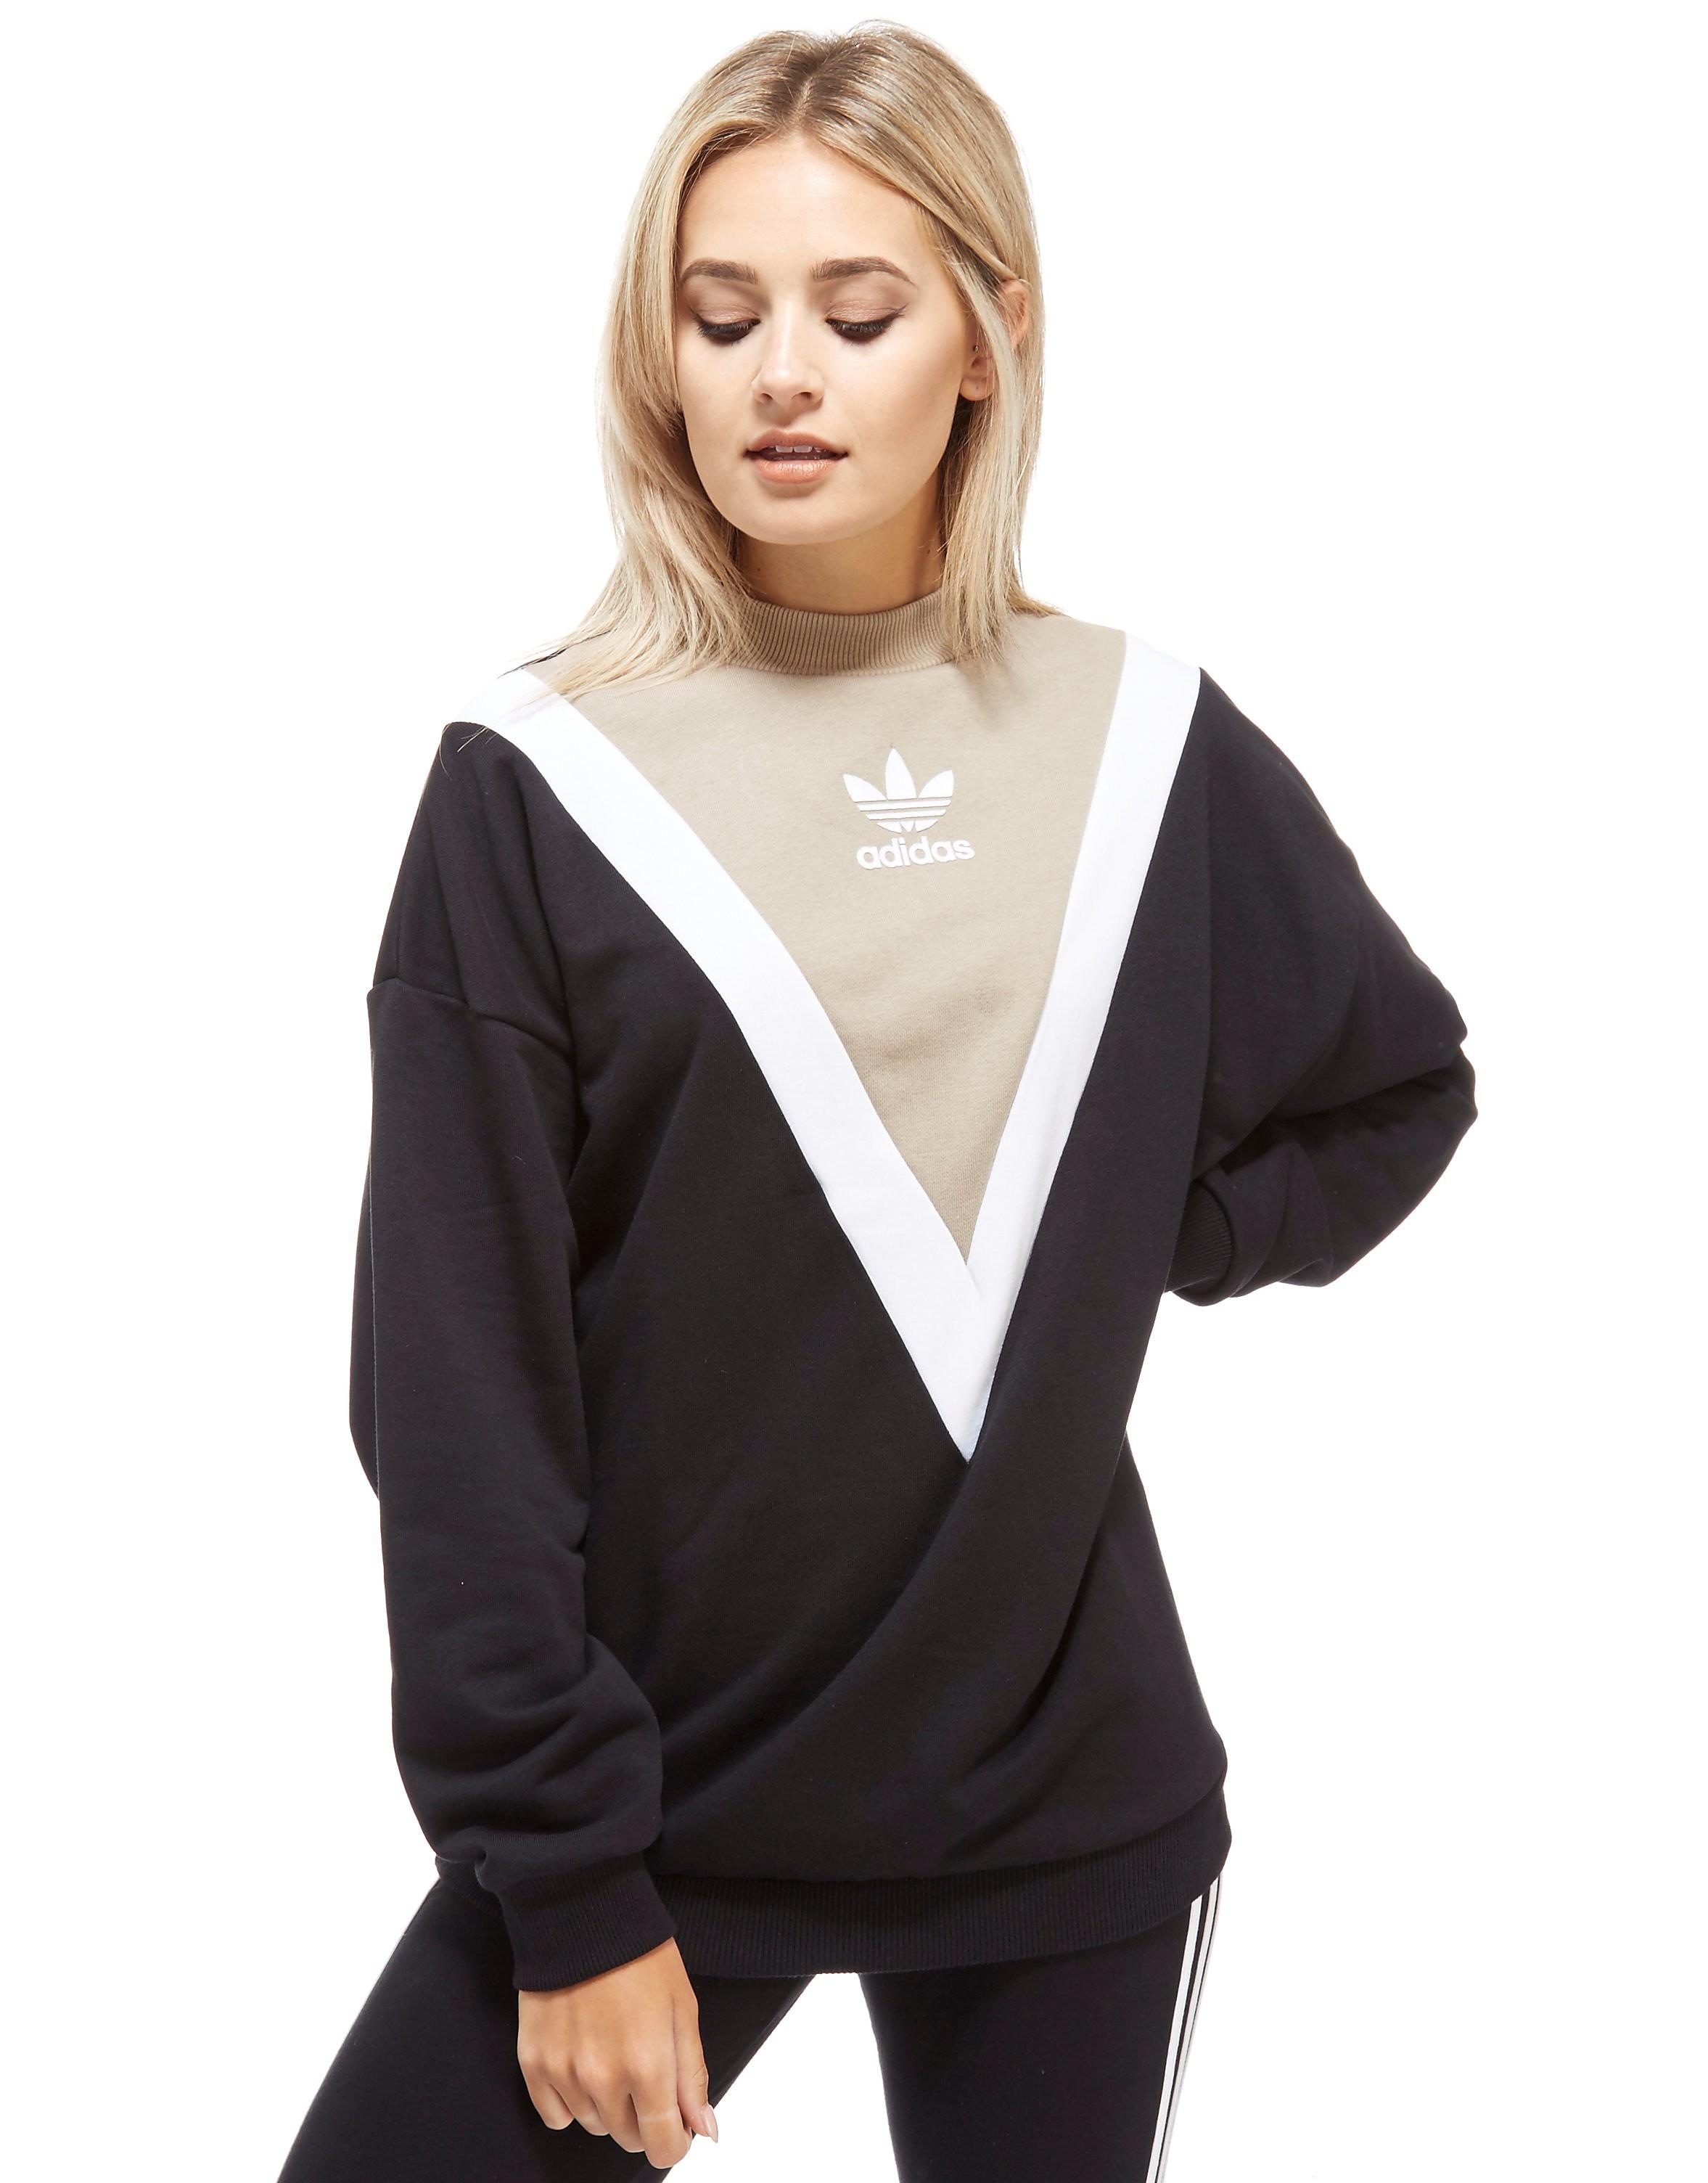 adidas Originals Sweatshirt Chevron Femme